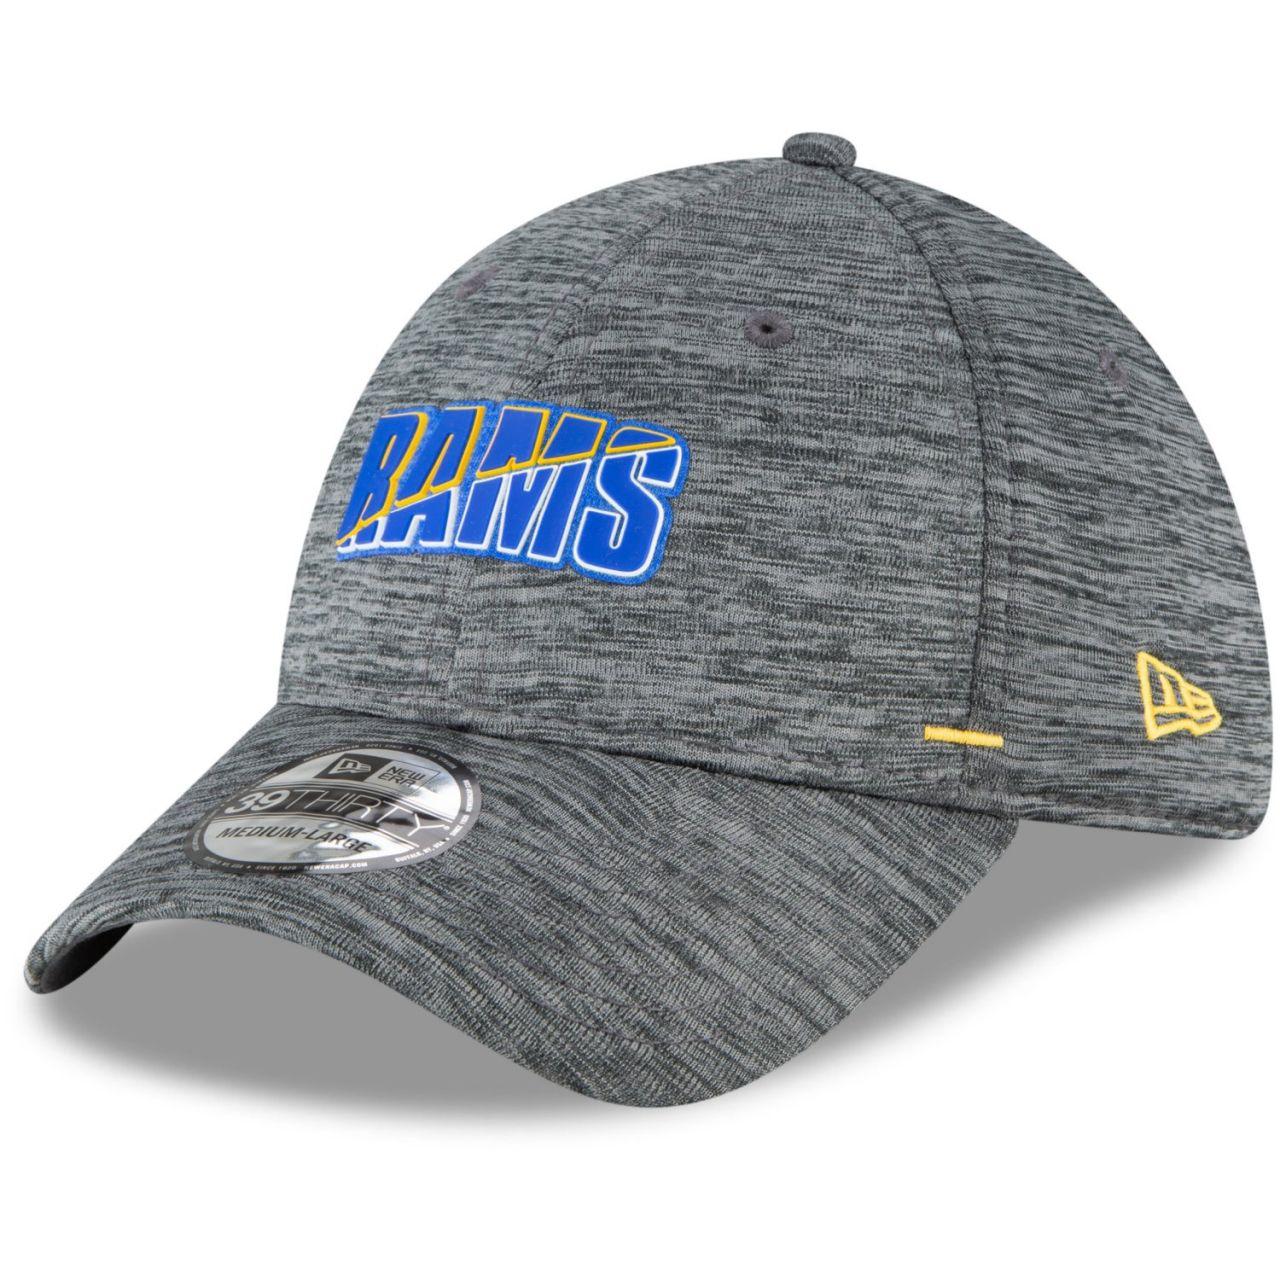 amfoo - New Era 39Thirty Cap - NFL CAMP Los Angeles Rams